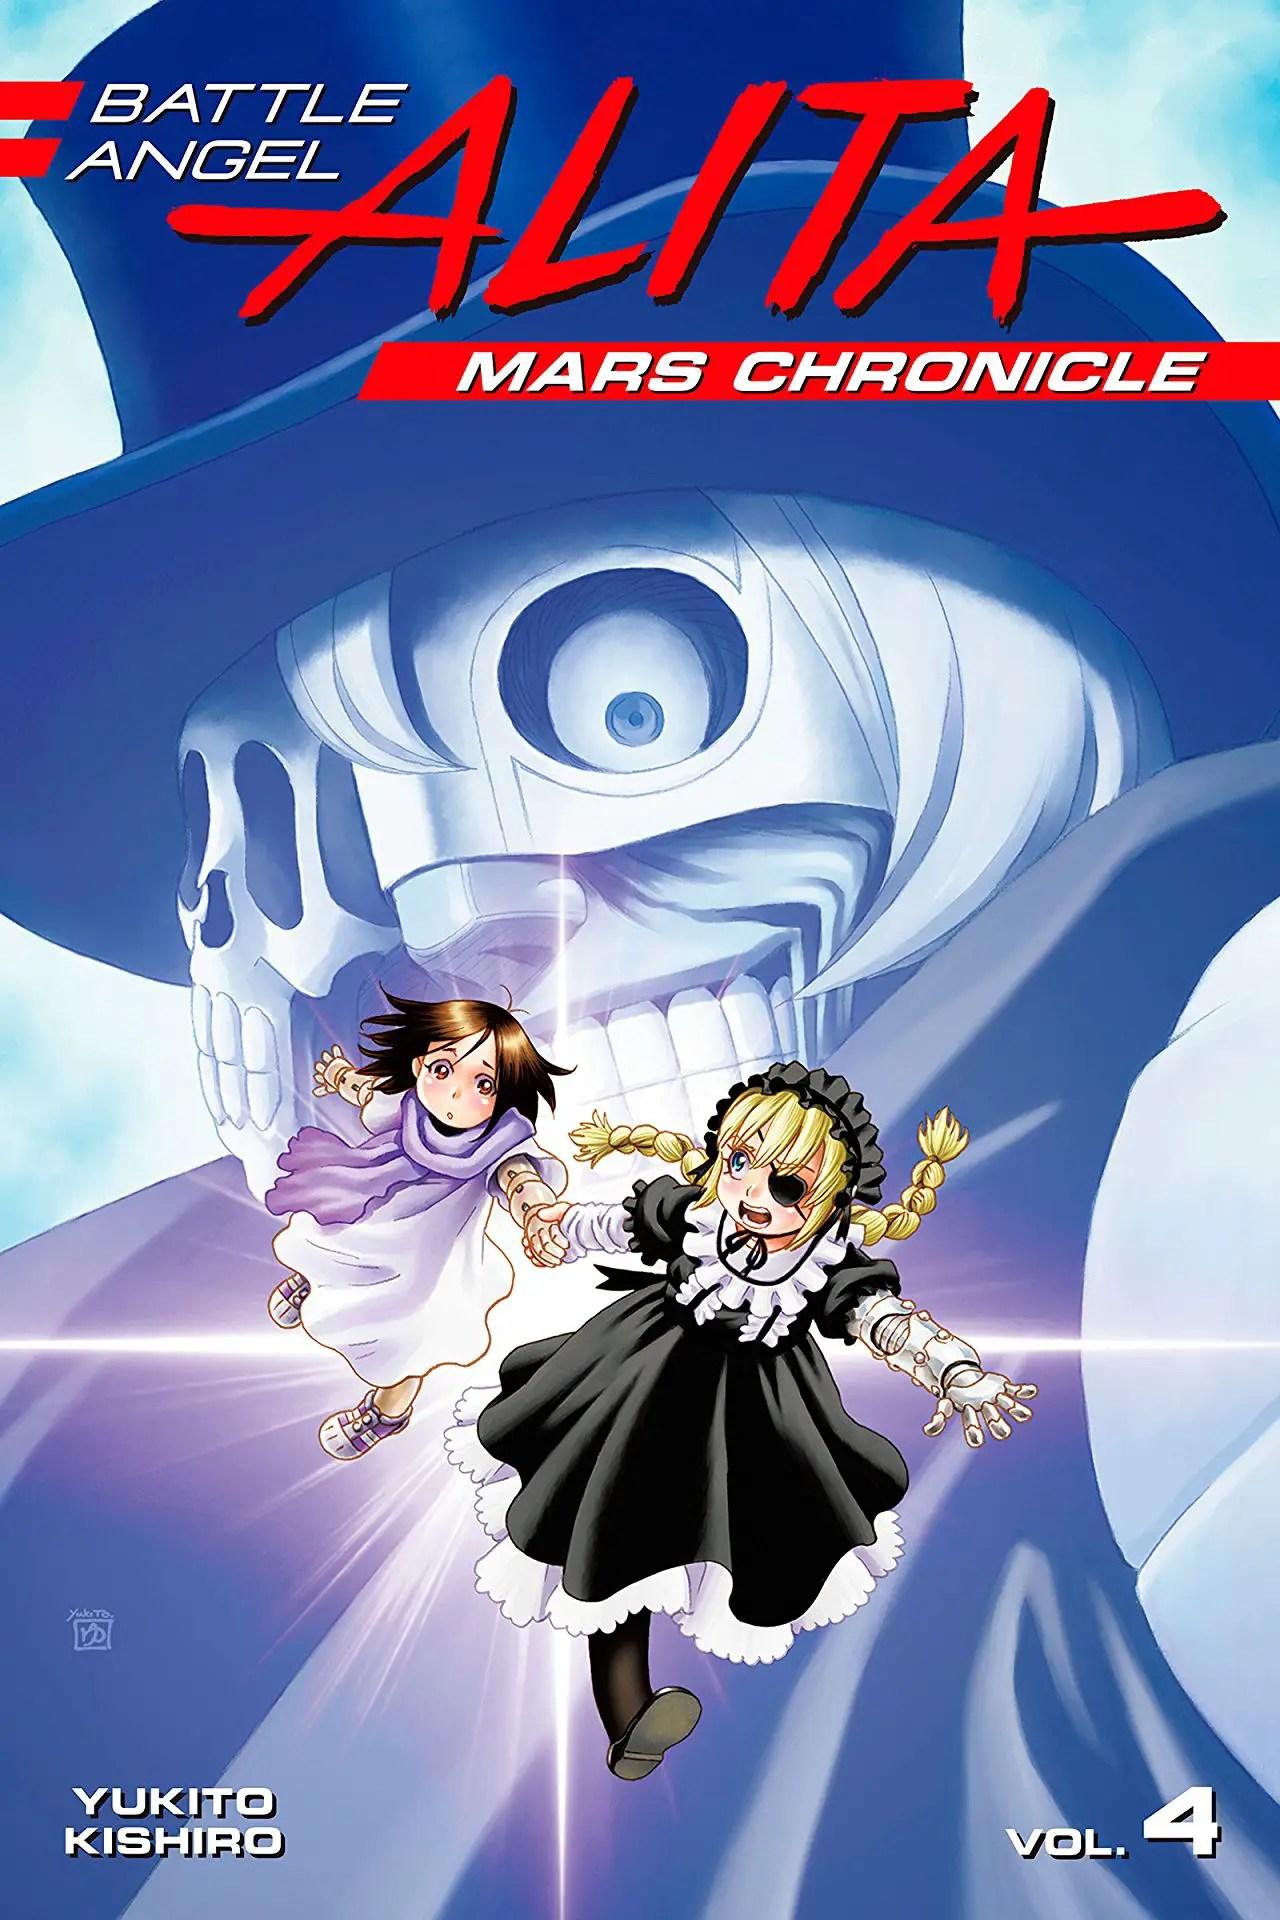 Battle Angel Alita: Mars Chronicle 4 Review